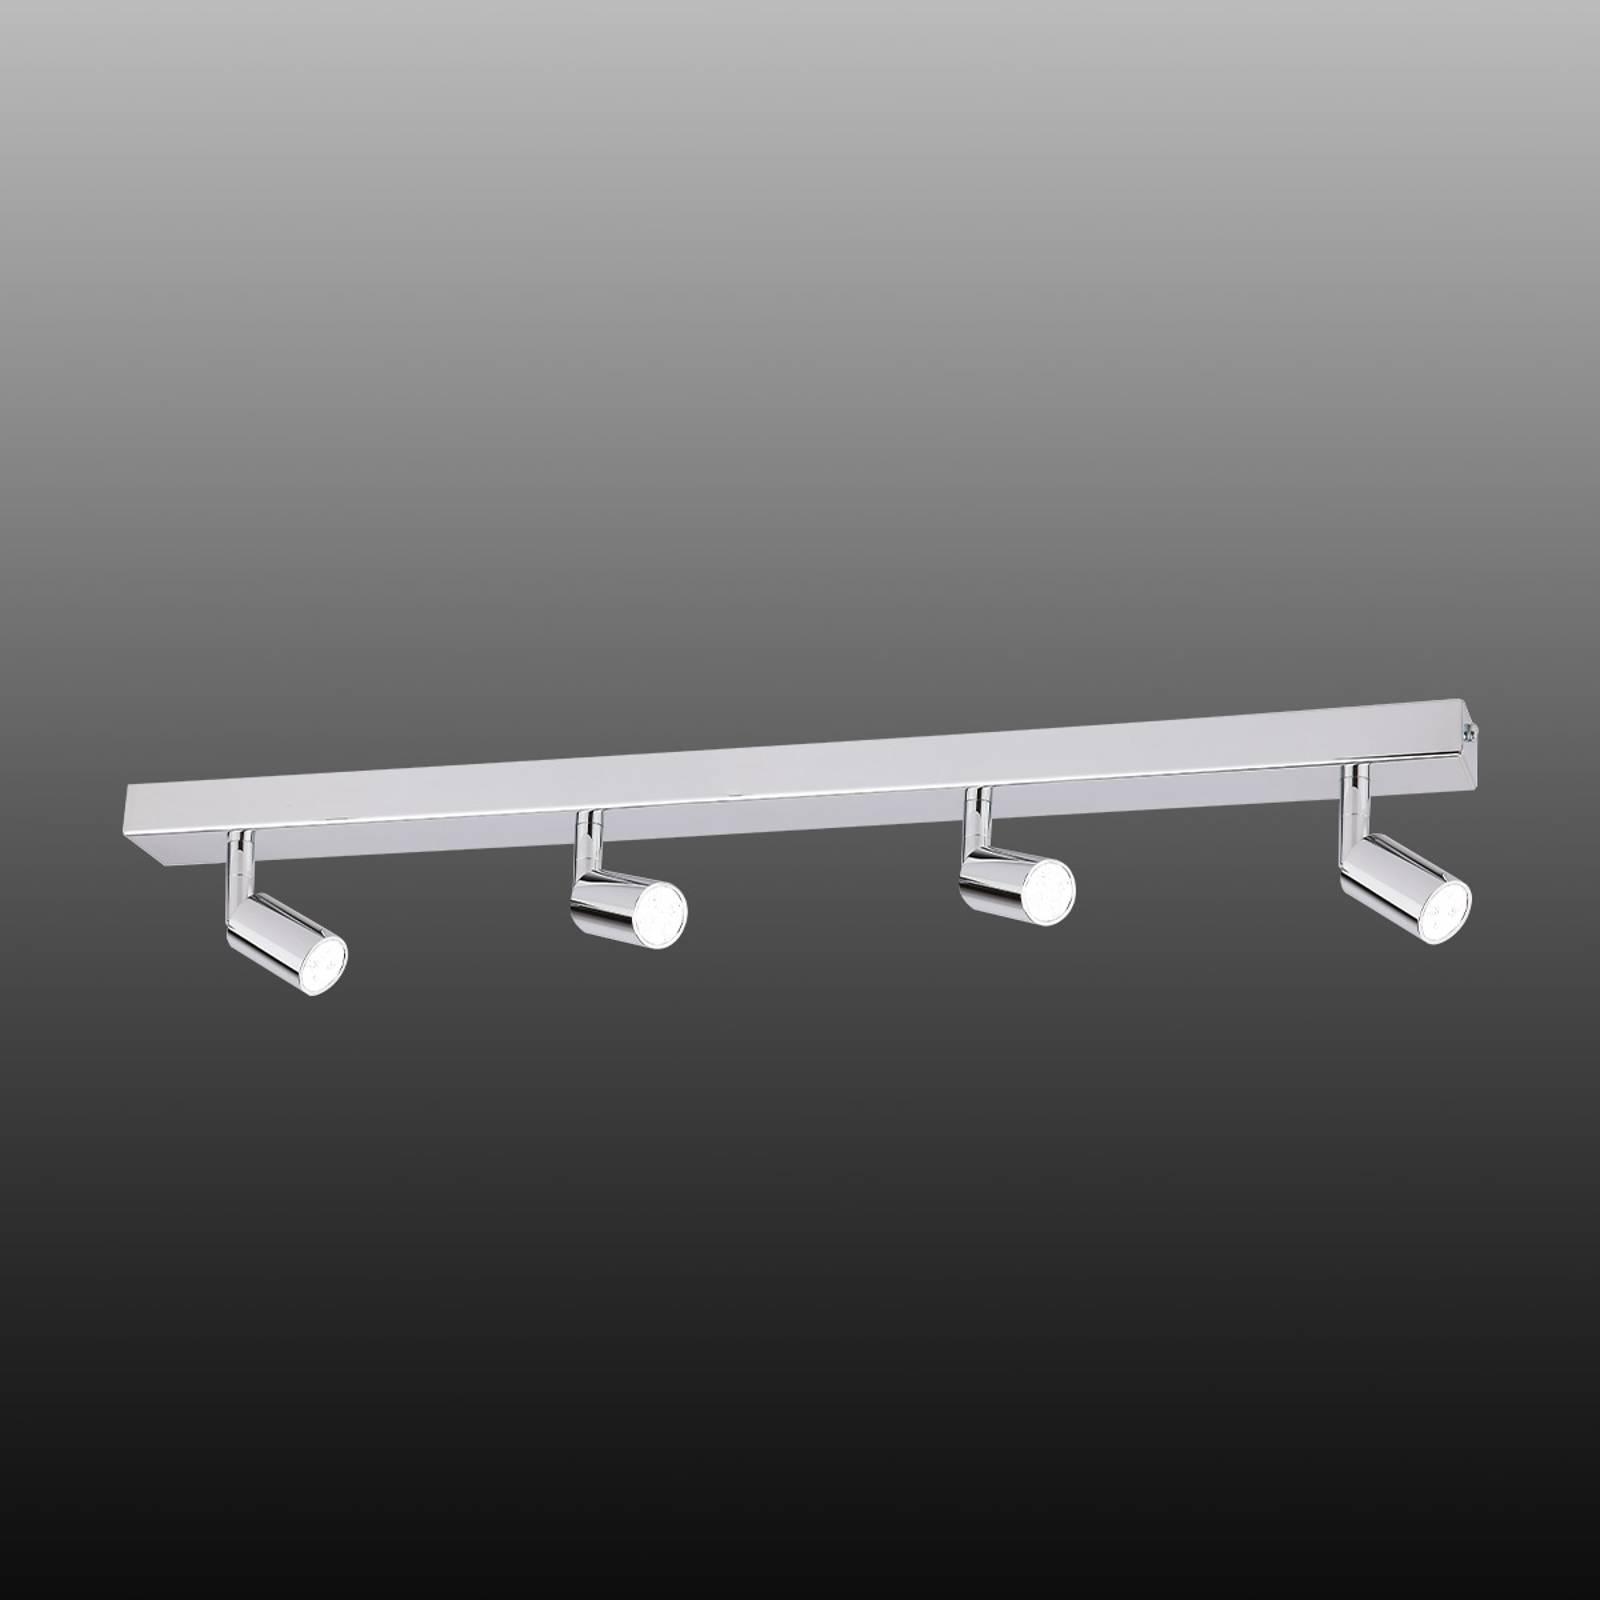 Moderni LED-kattovalaisin, 4-lamppuinen